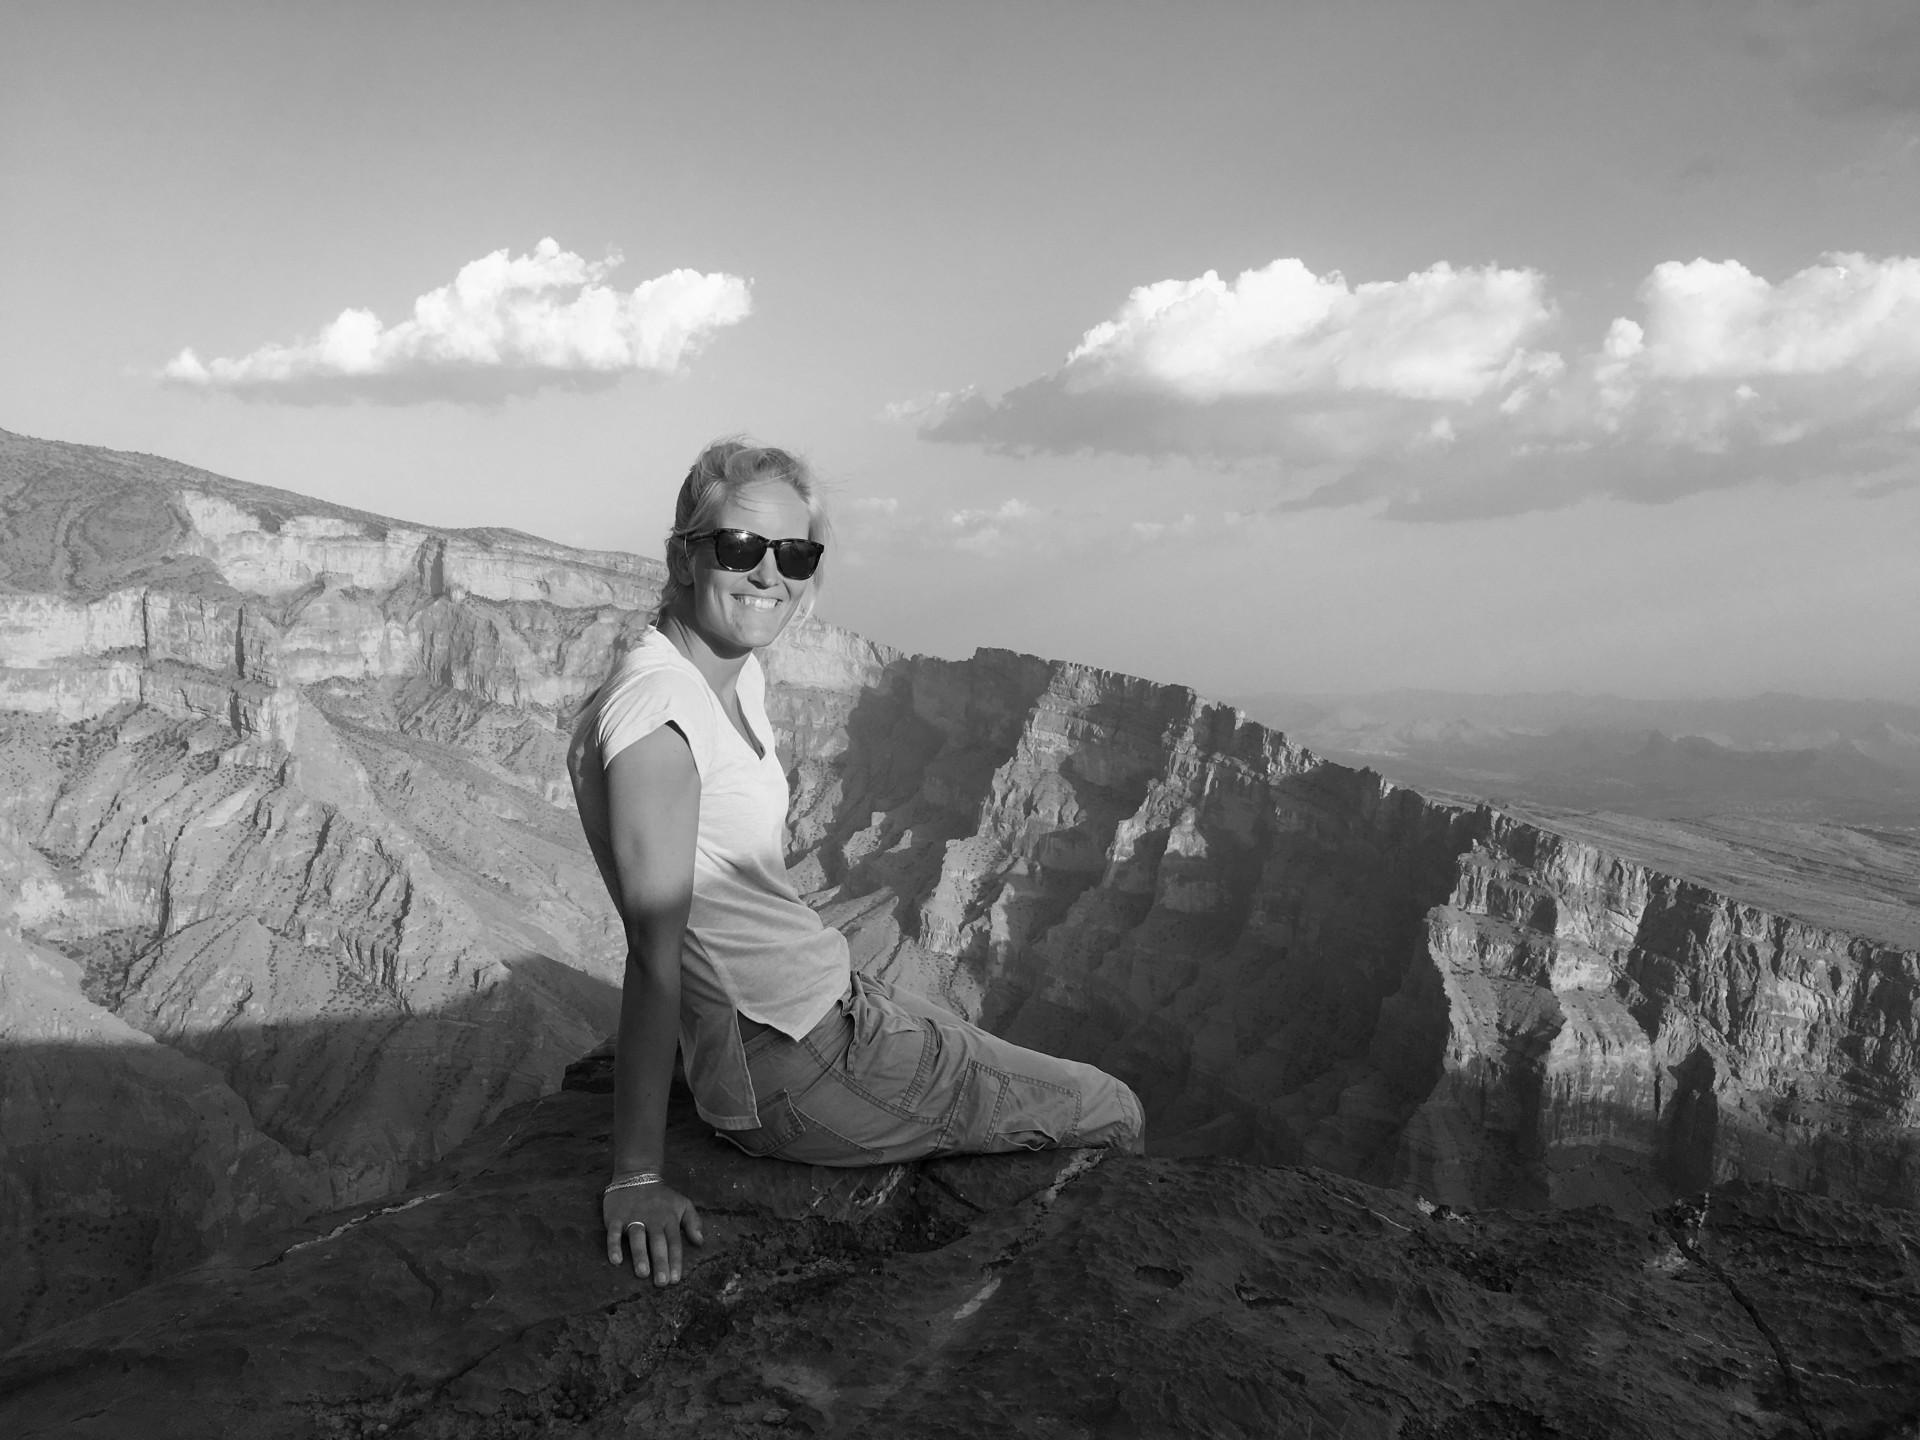 Reisspecialist Leonie van &Olives